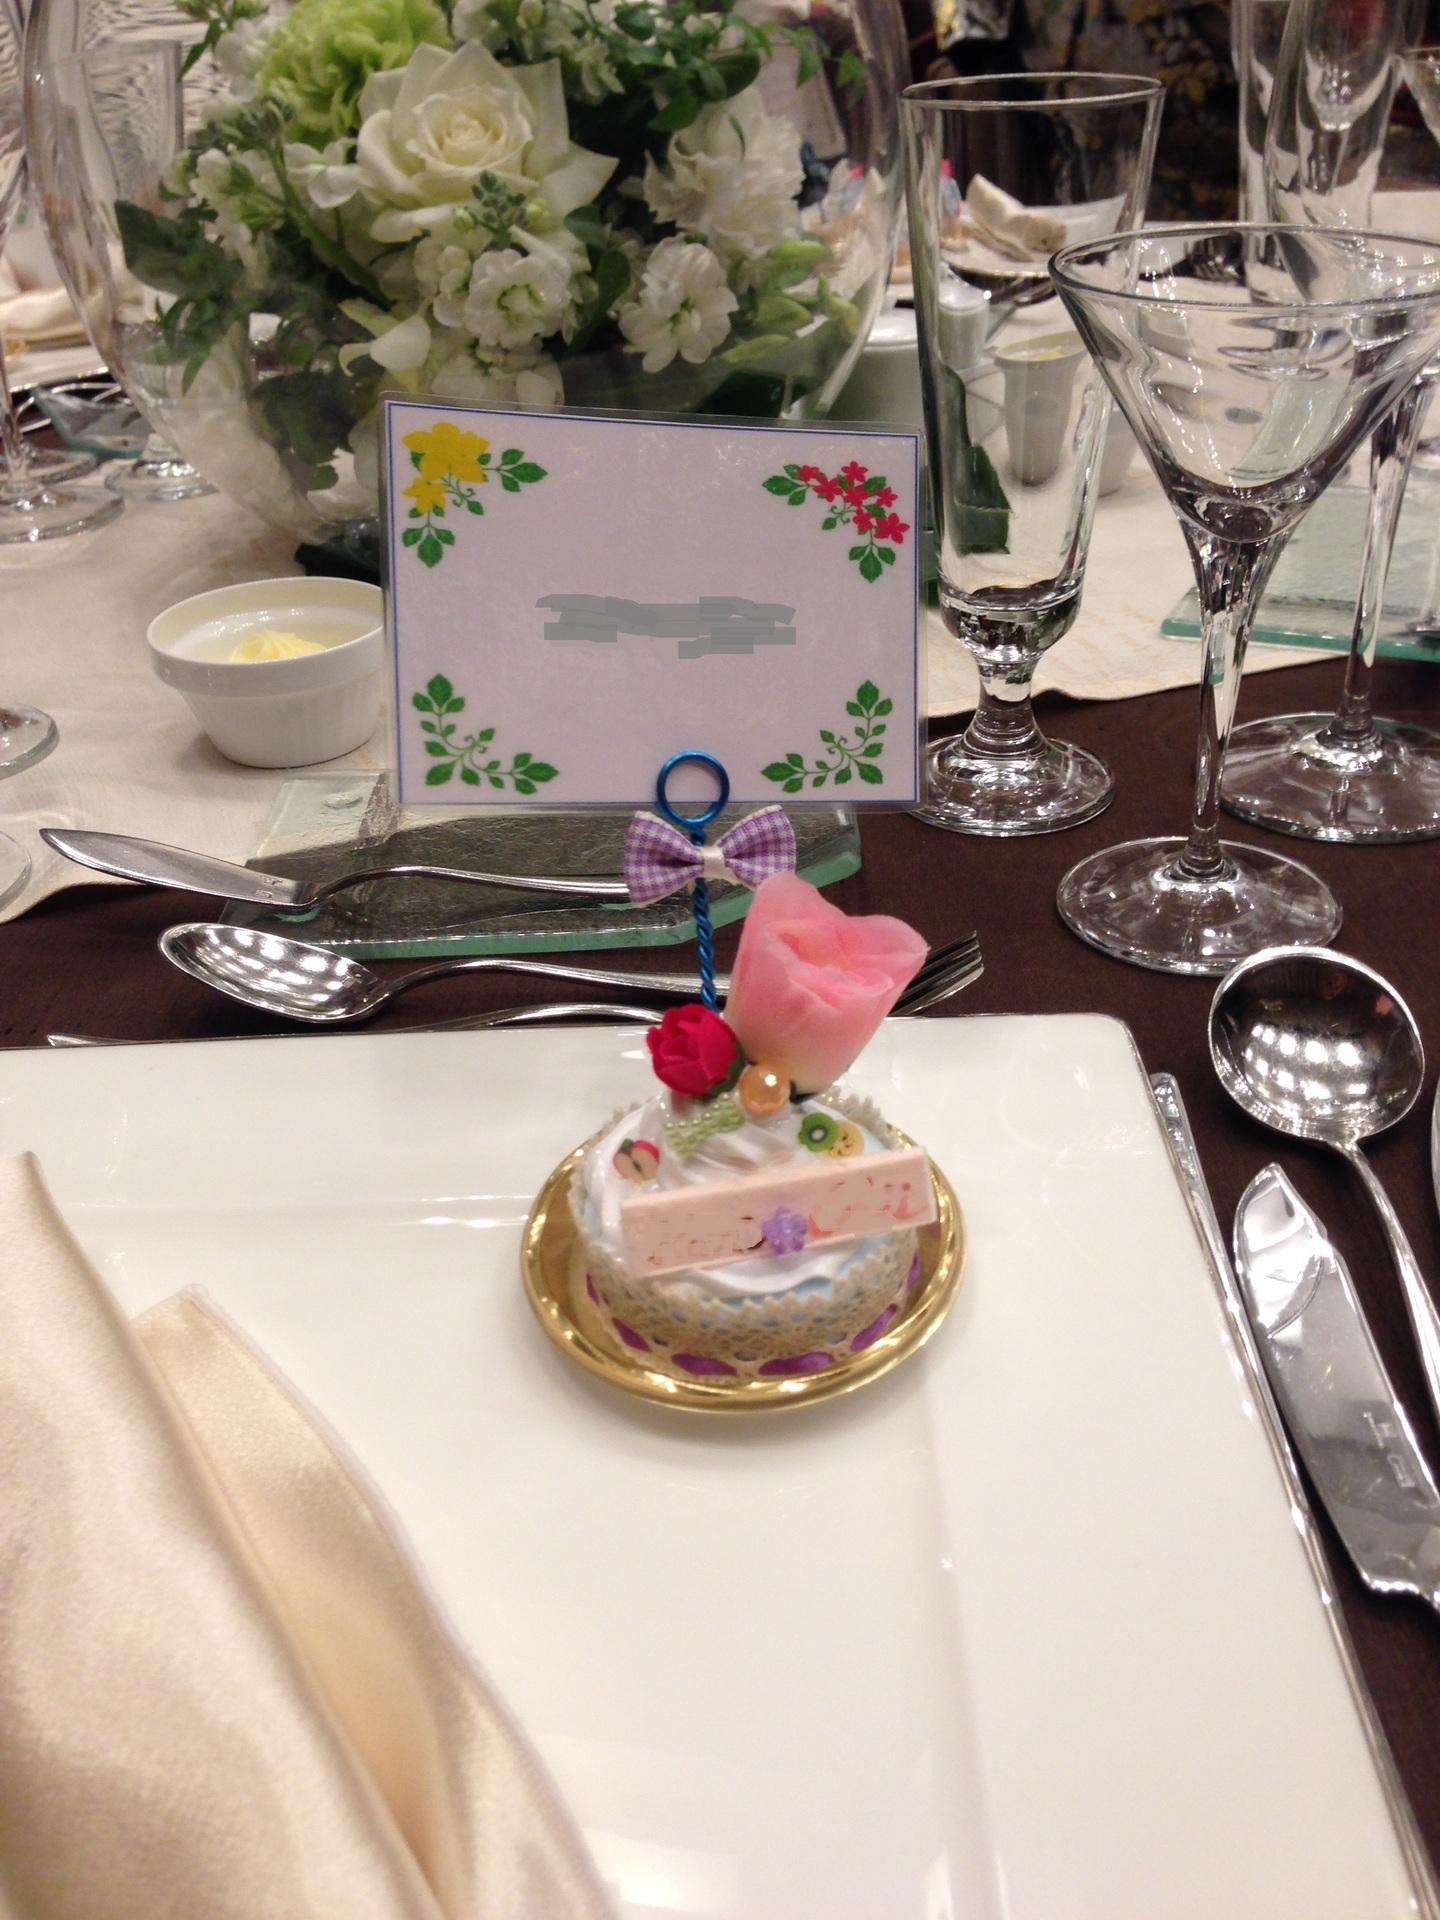 Shiosanの工作 娘の結婚式の席札立てをブライダル小物として親からの